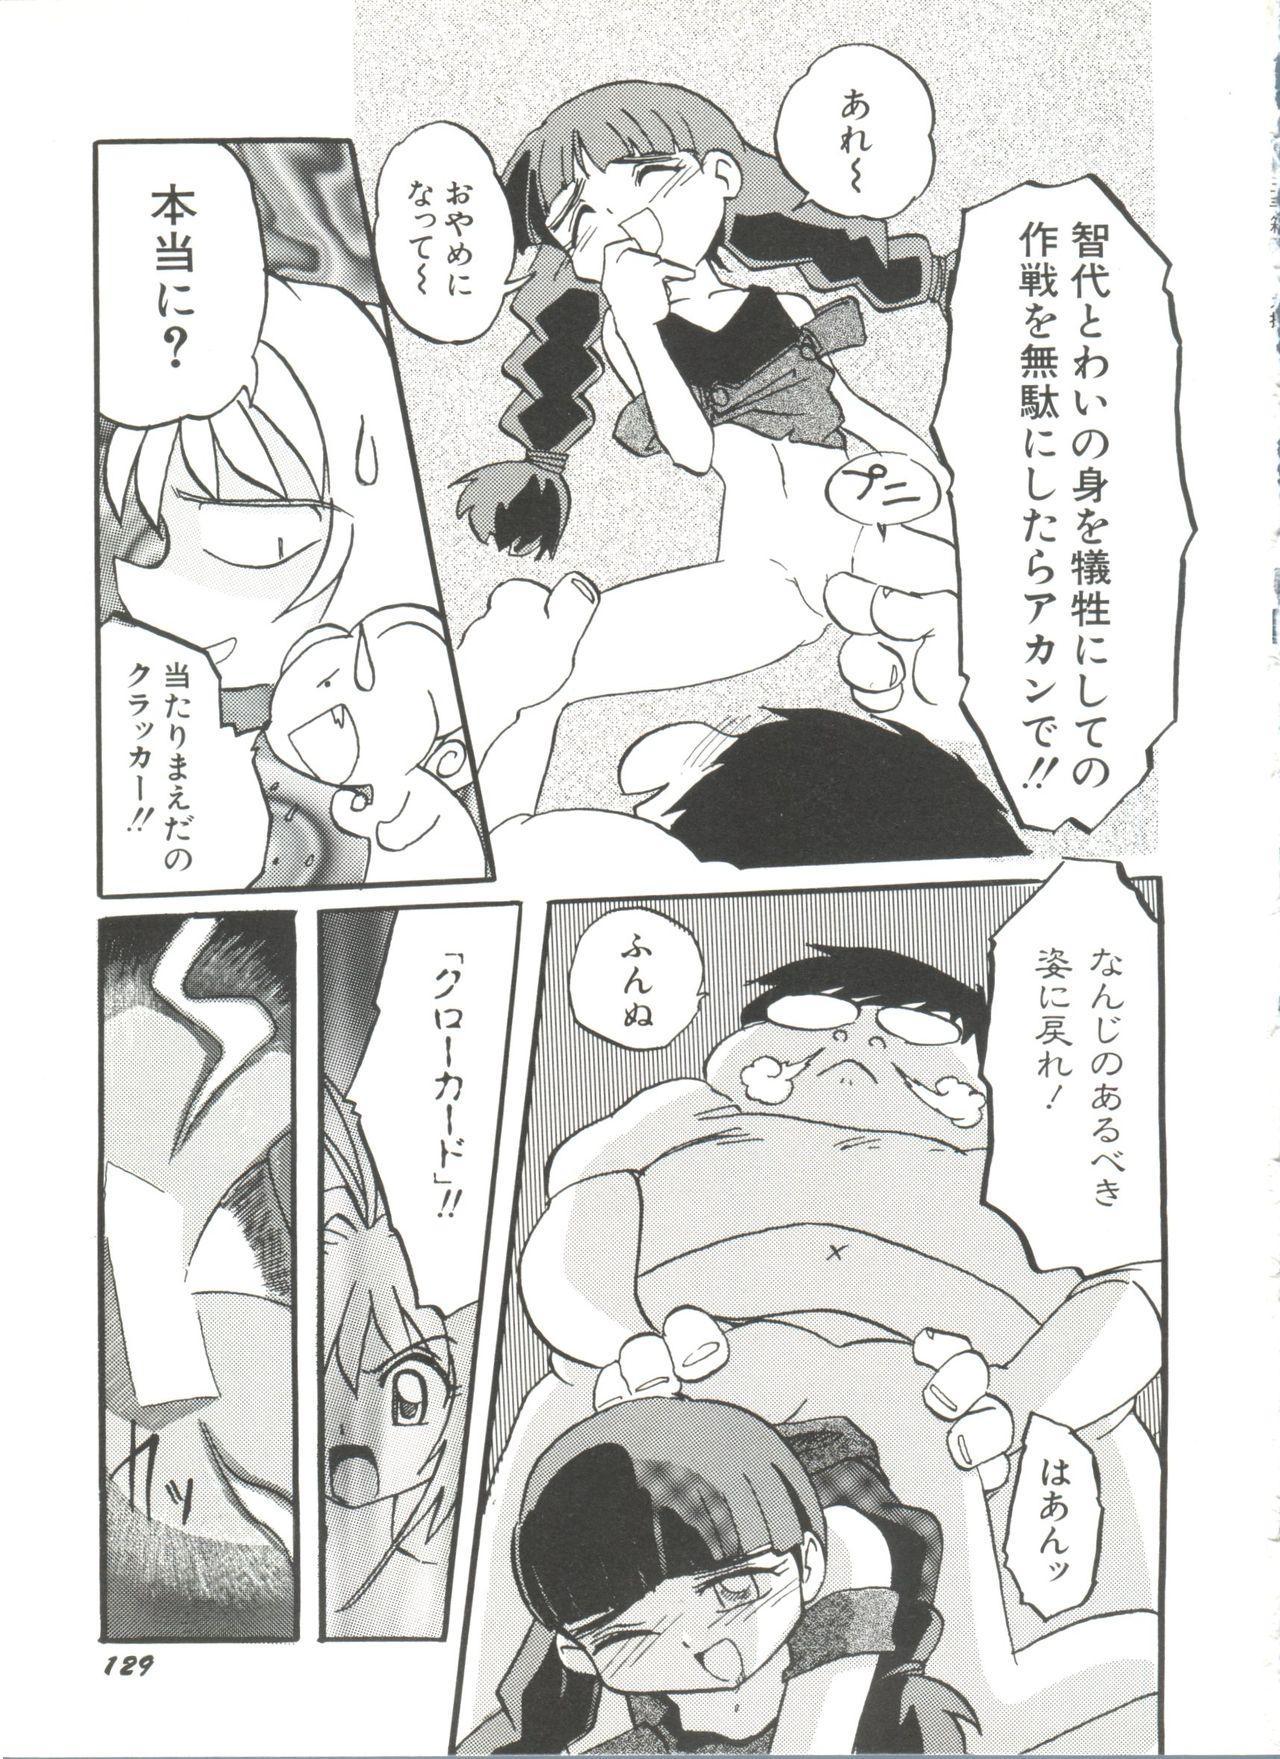 [Anthology] Denei Tamatebako 8 - Utakata no Tenshi-tachi II (Various) 130